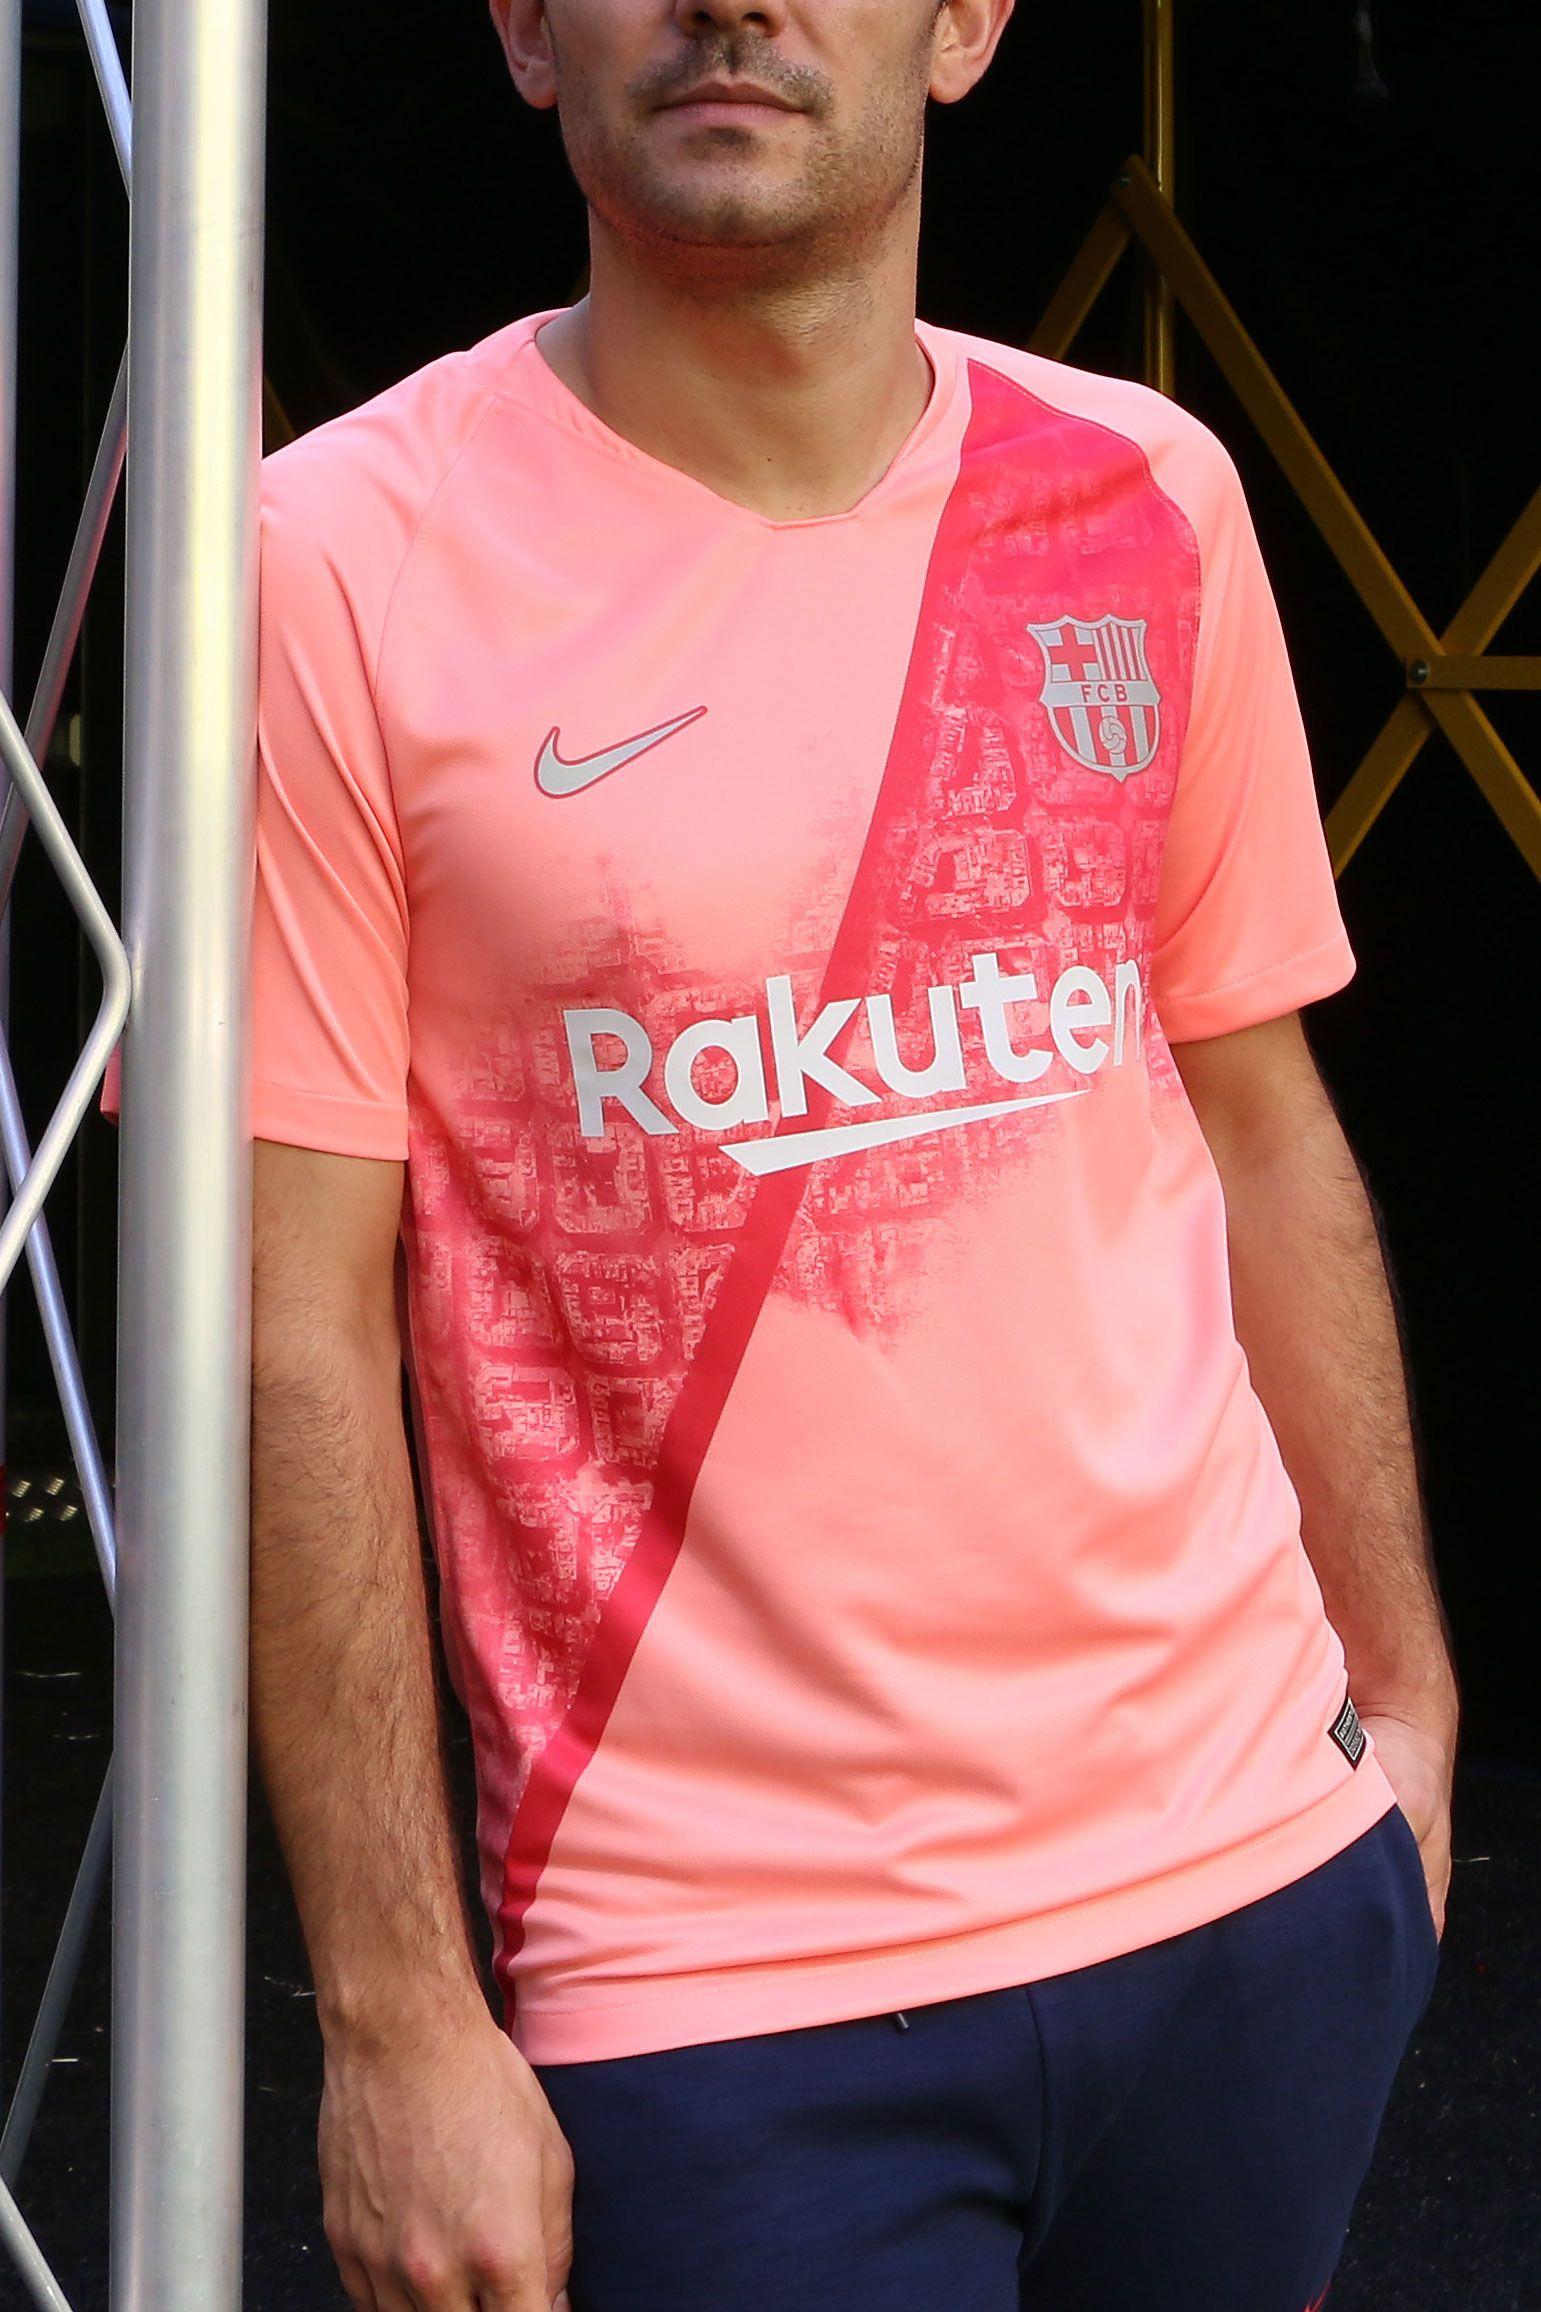 Camiseta oficial Nike tercera equipación FC Barcelona 2018 2019 - rosa  Foto  Marcela Sansalvador para cb77b6d609c